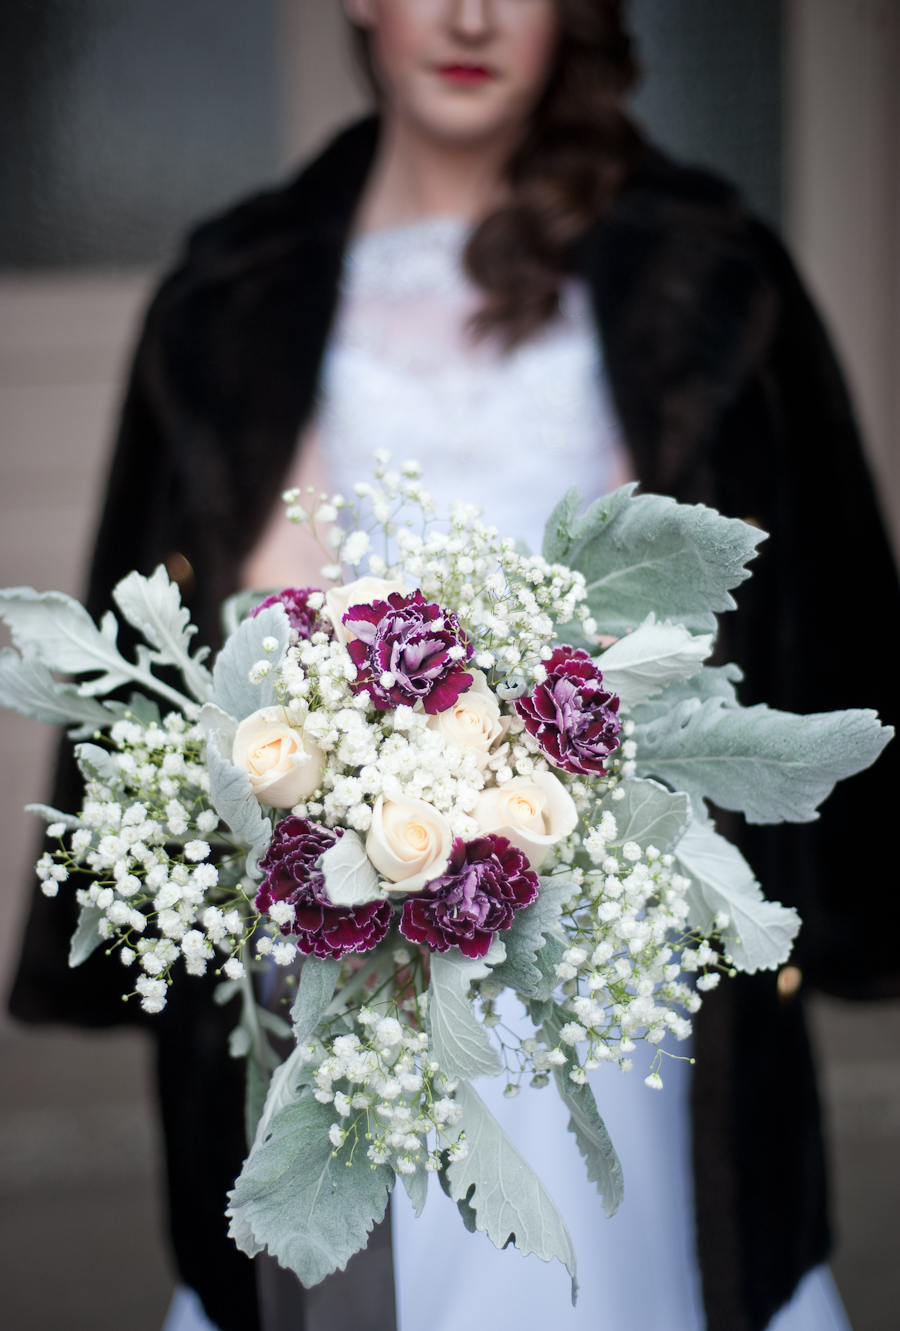 Susannah_Deangelo_Antique_Silver_Music_Hall_Wedding-2.jpg